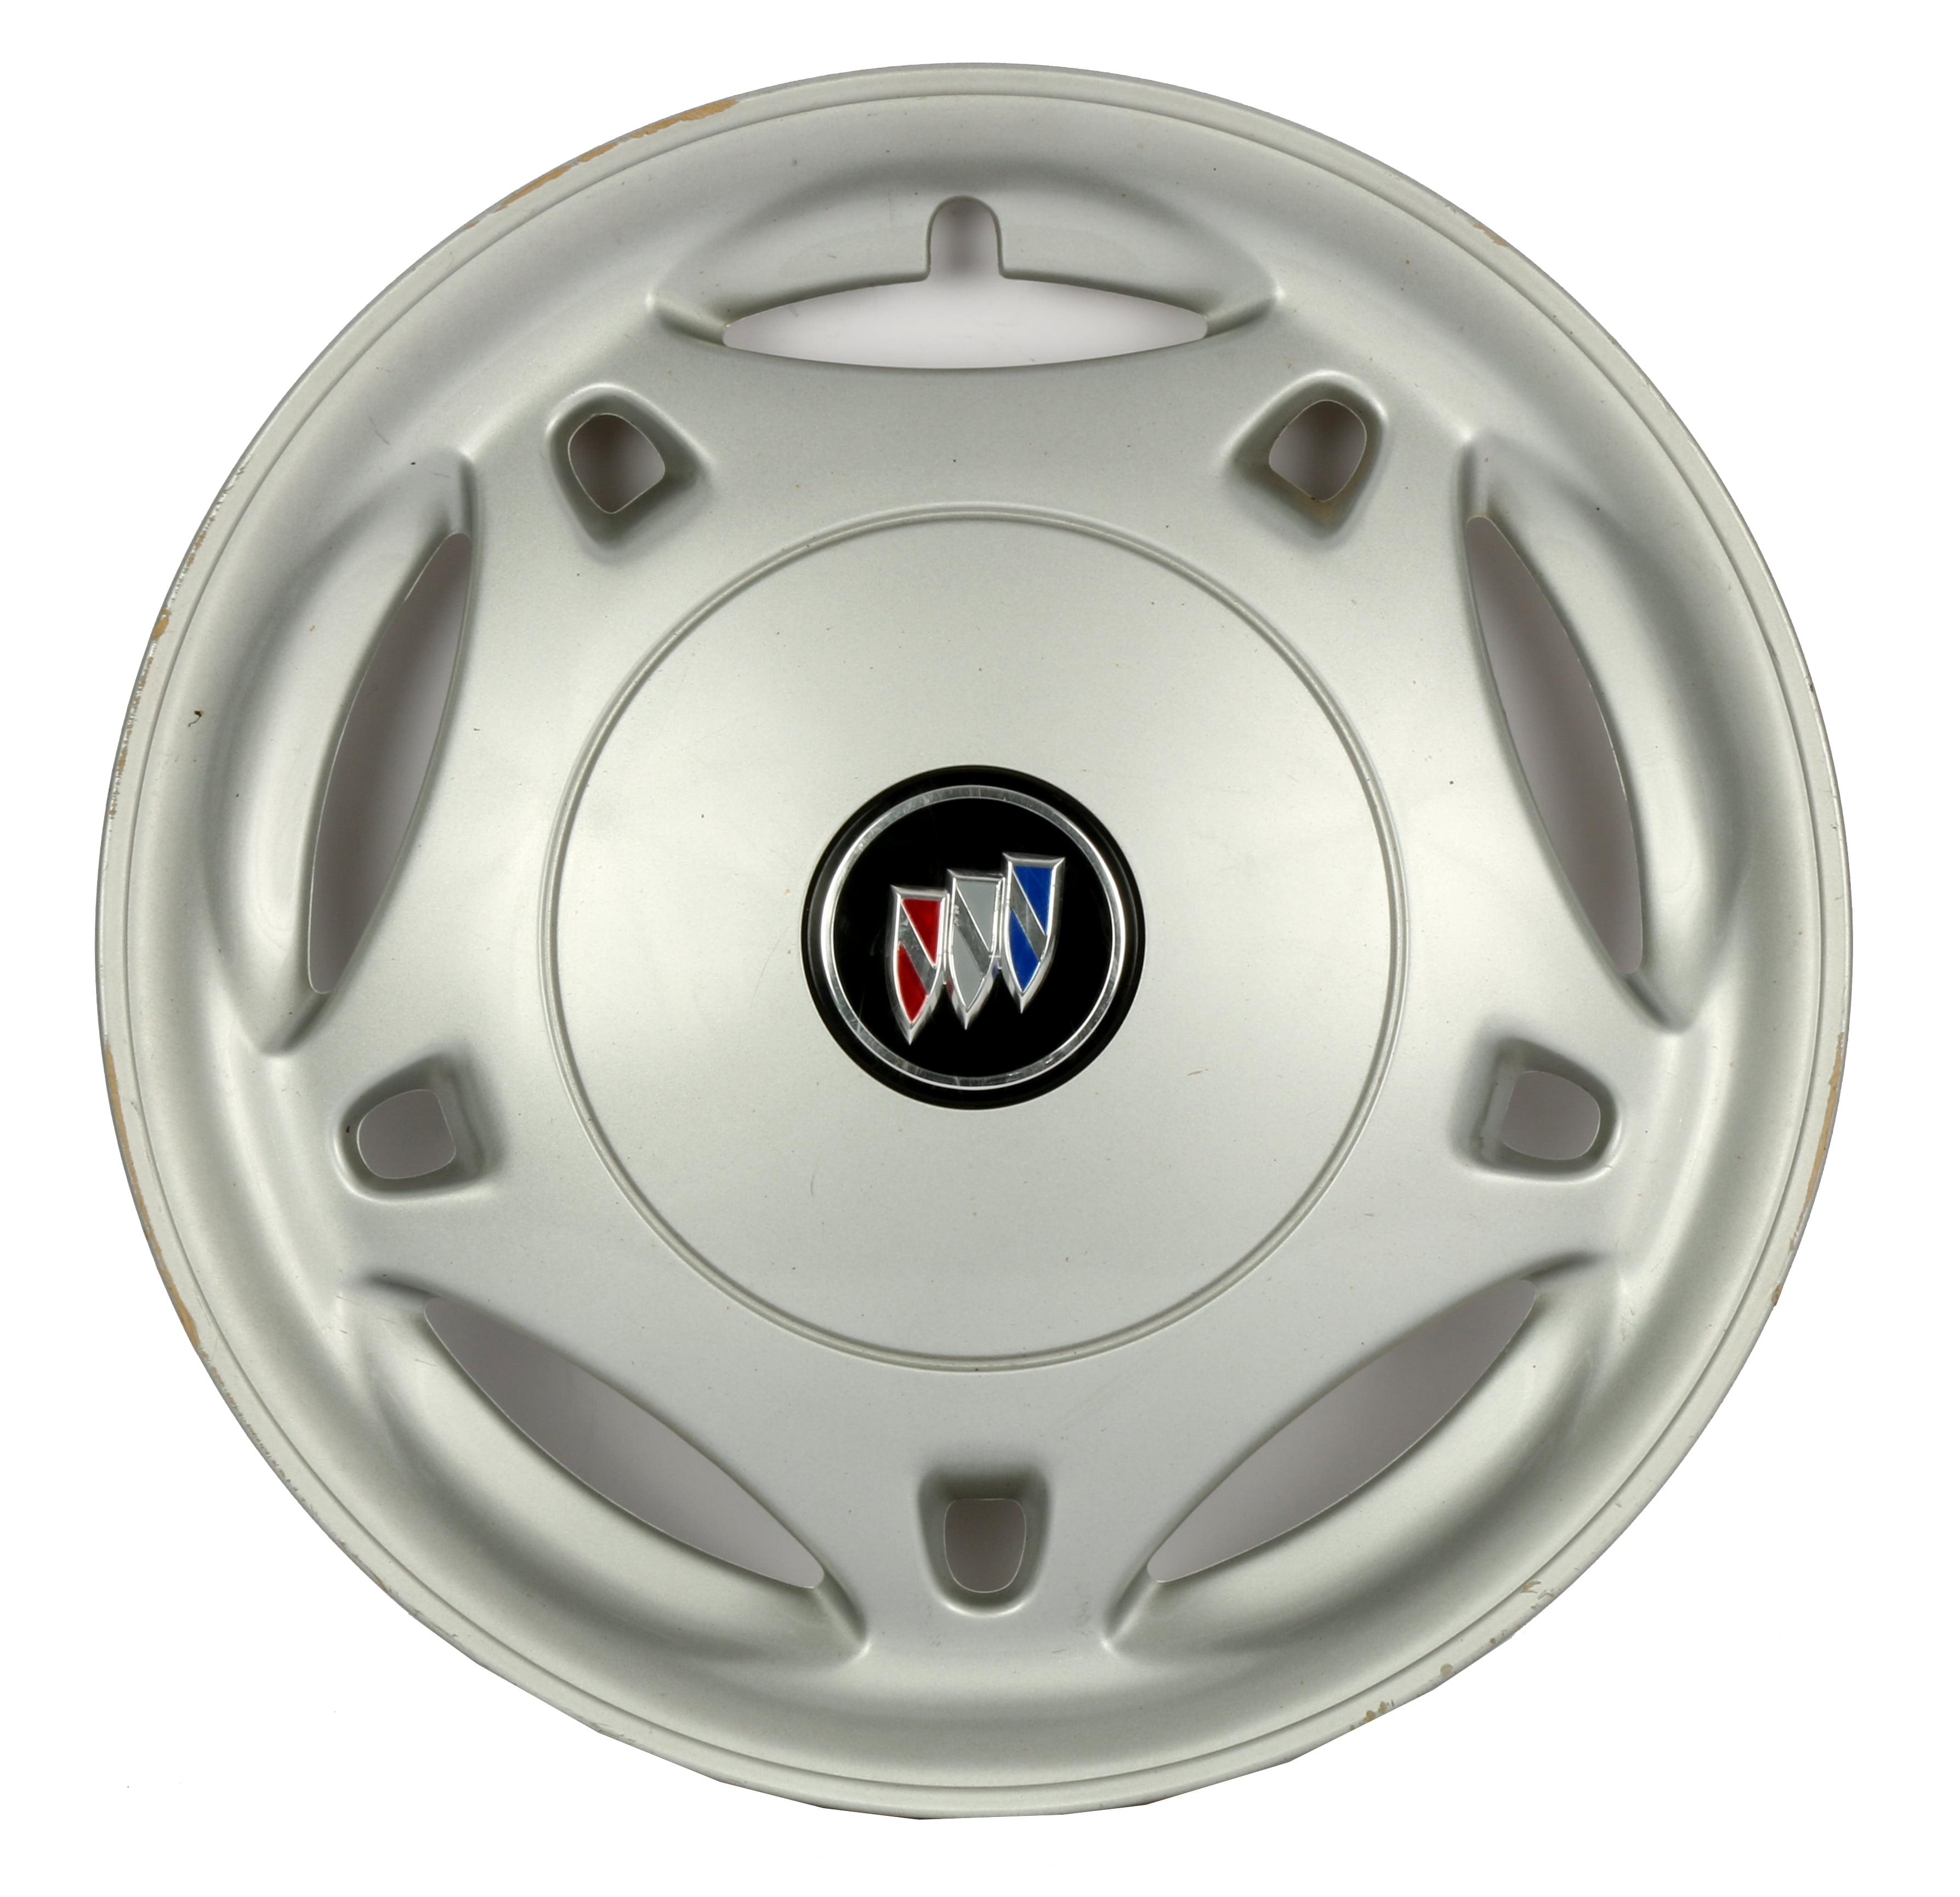 1992-1993 Buick Skylark OEM Original Single 5 Slot Wheel